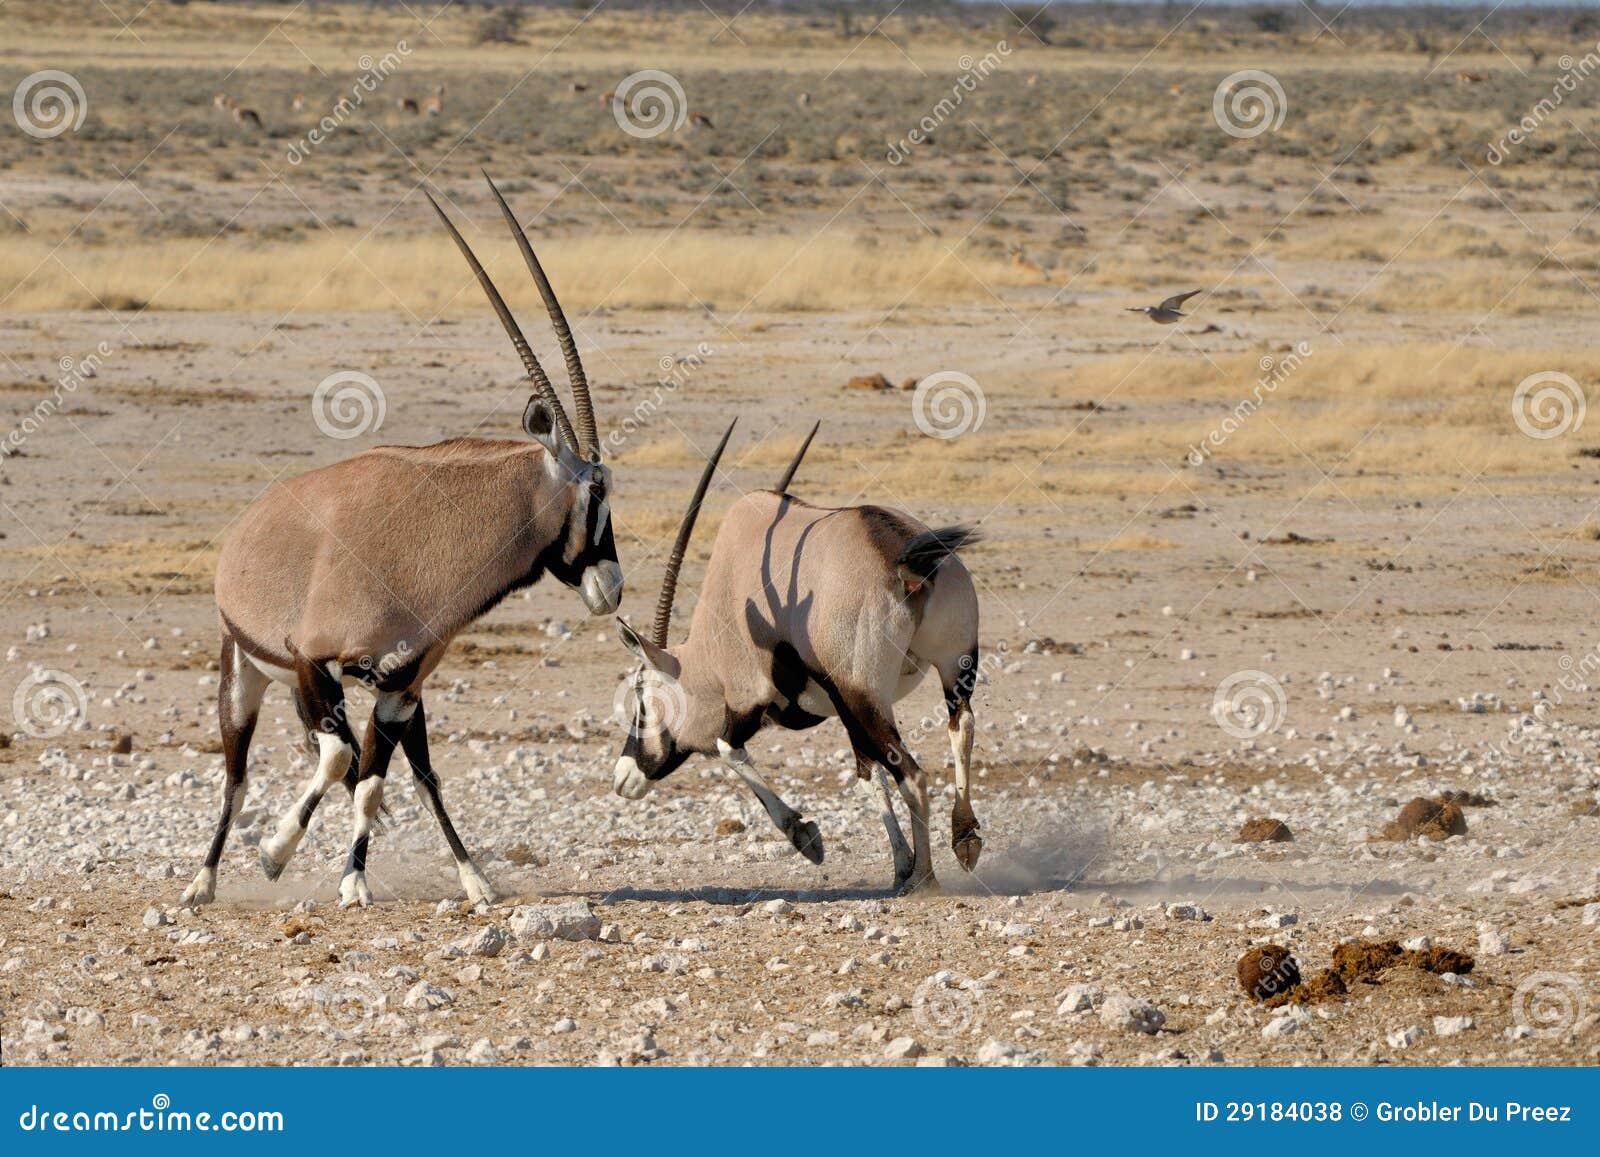 Orix (Gemsbok) Fighting Royalty Free Stock Photos - Image ...